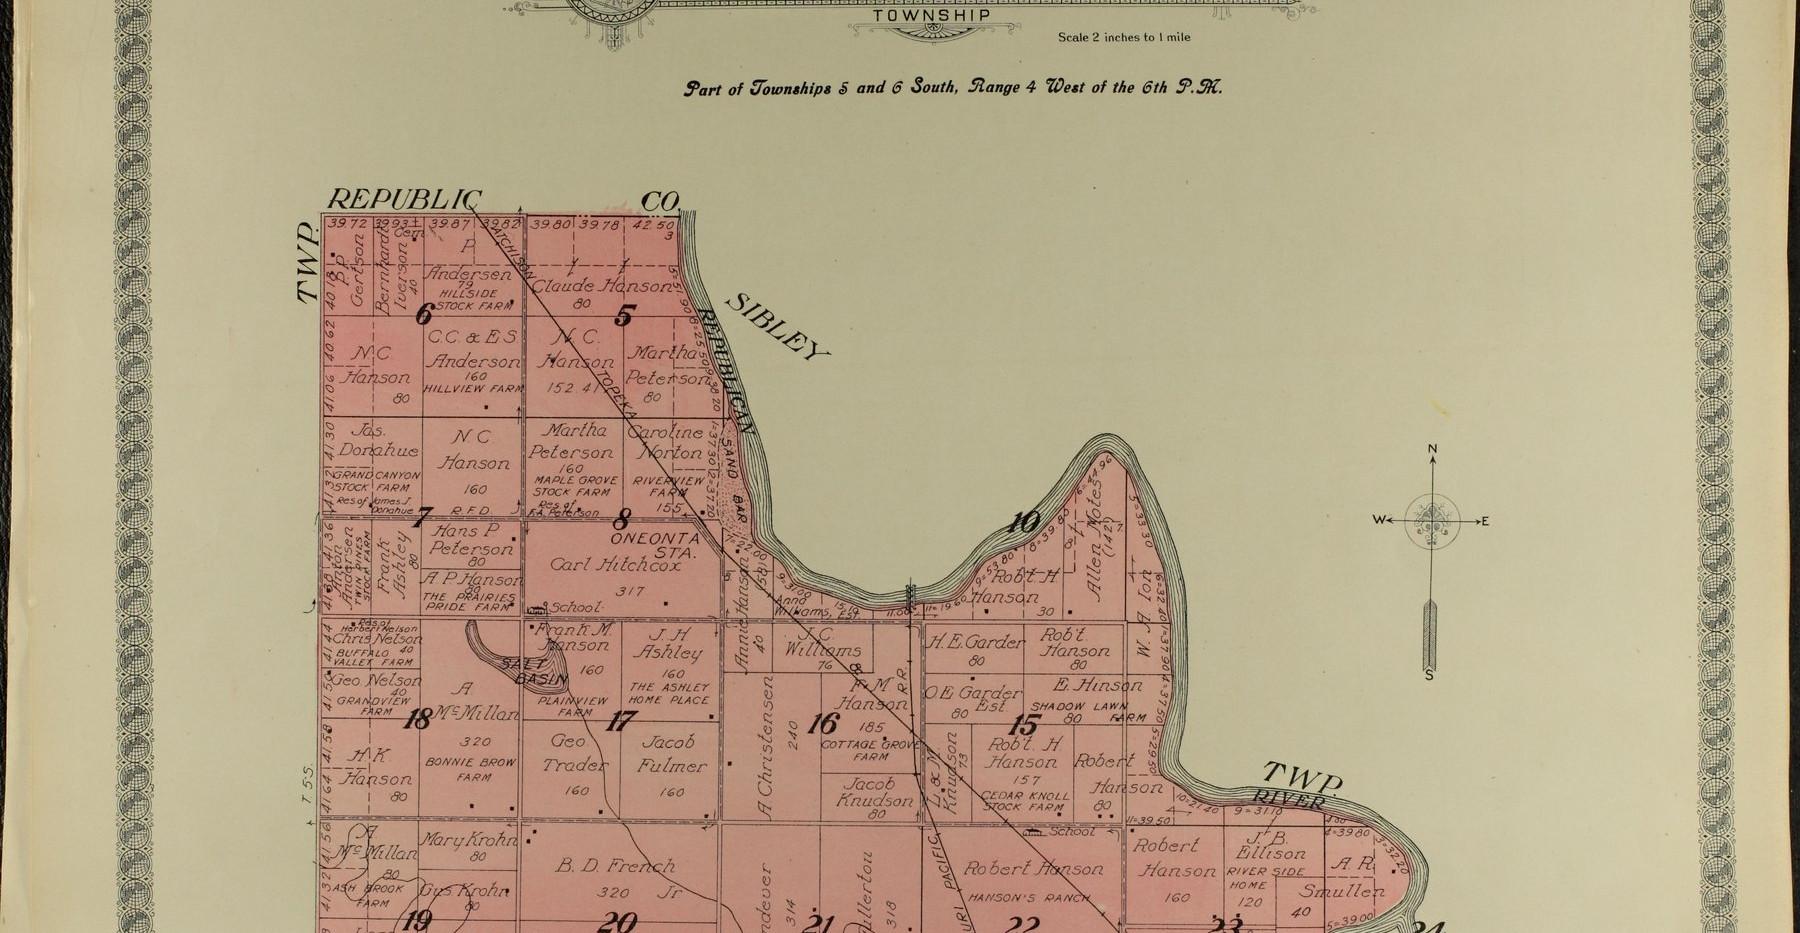 5a: Buffalo Township North